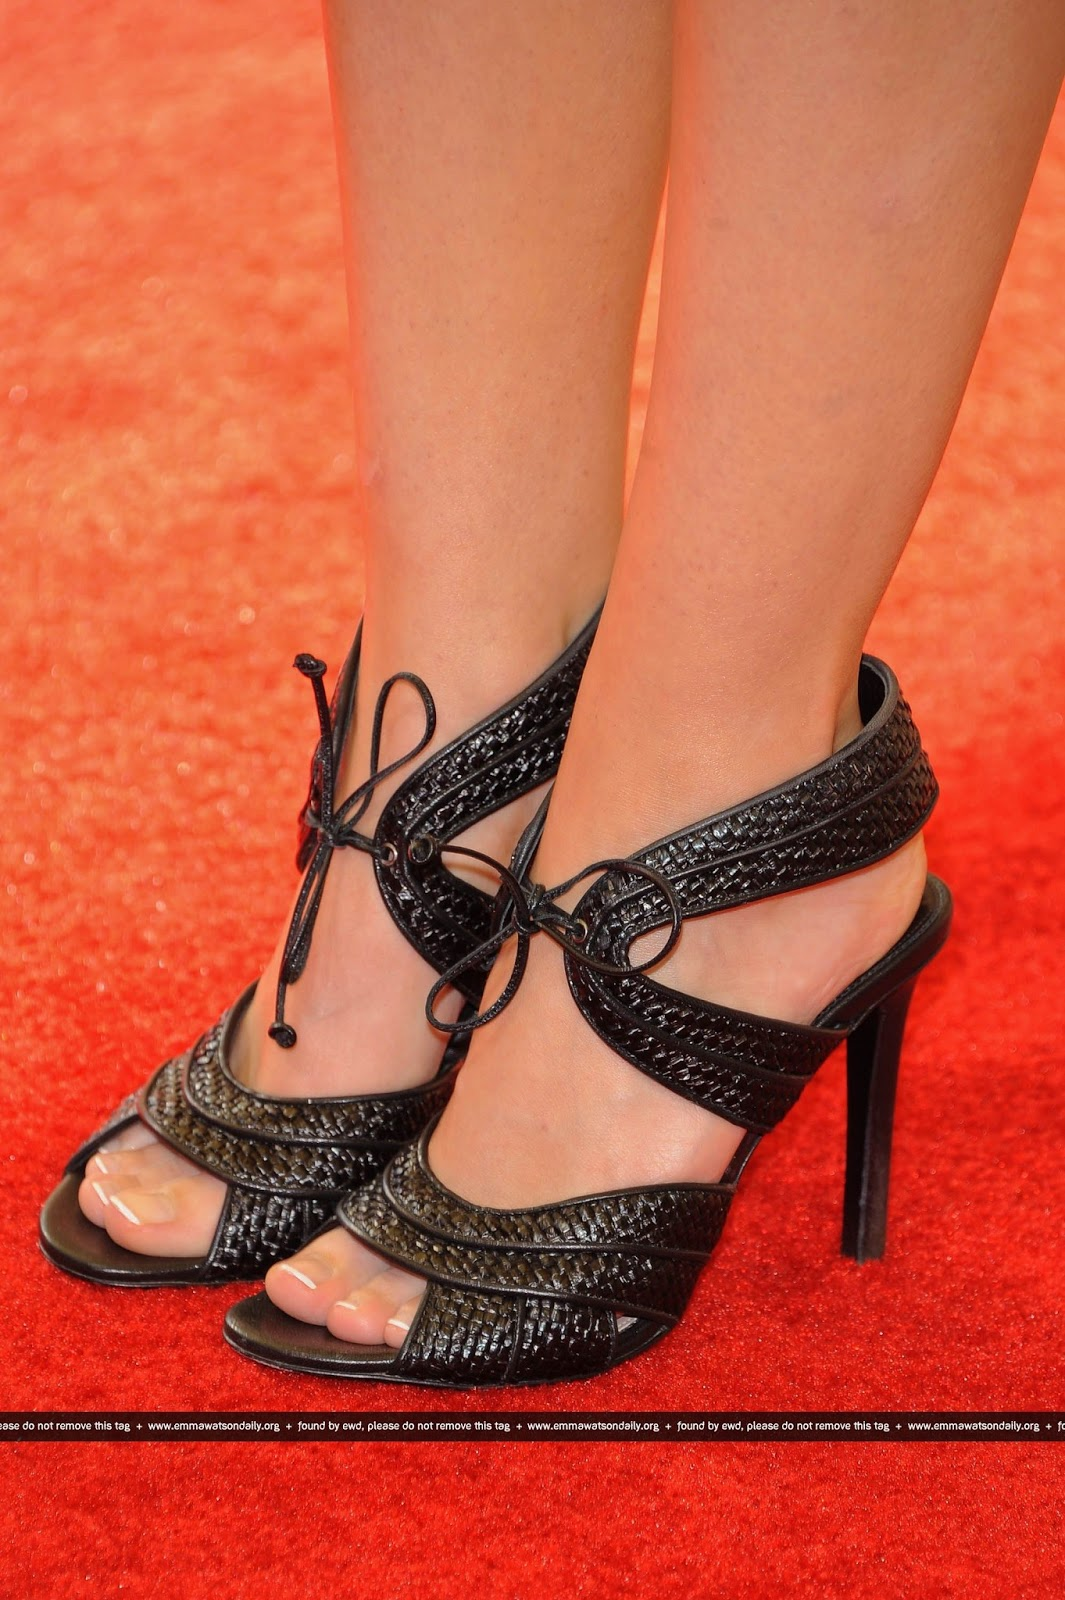 Emma Watson Hd Feet Photos Sexy Feet Capture - Celebrity -6318